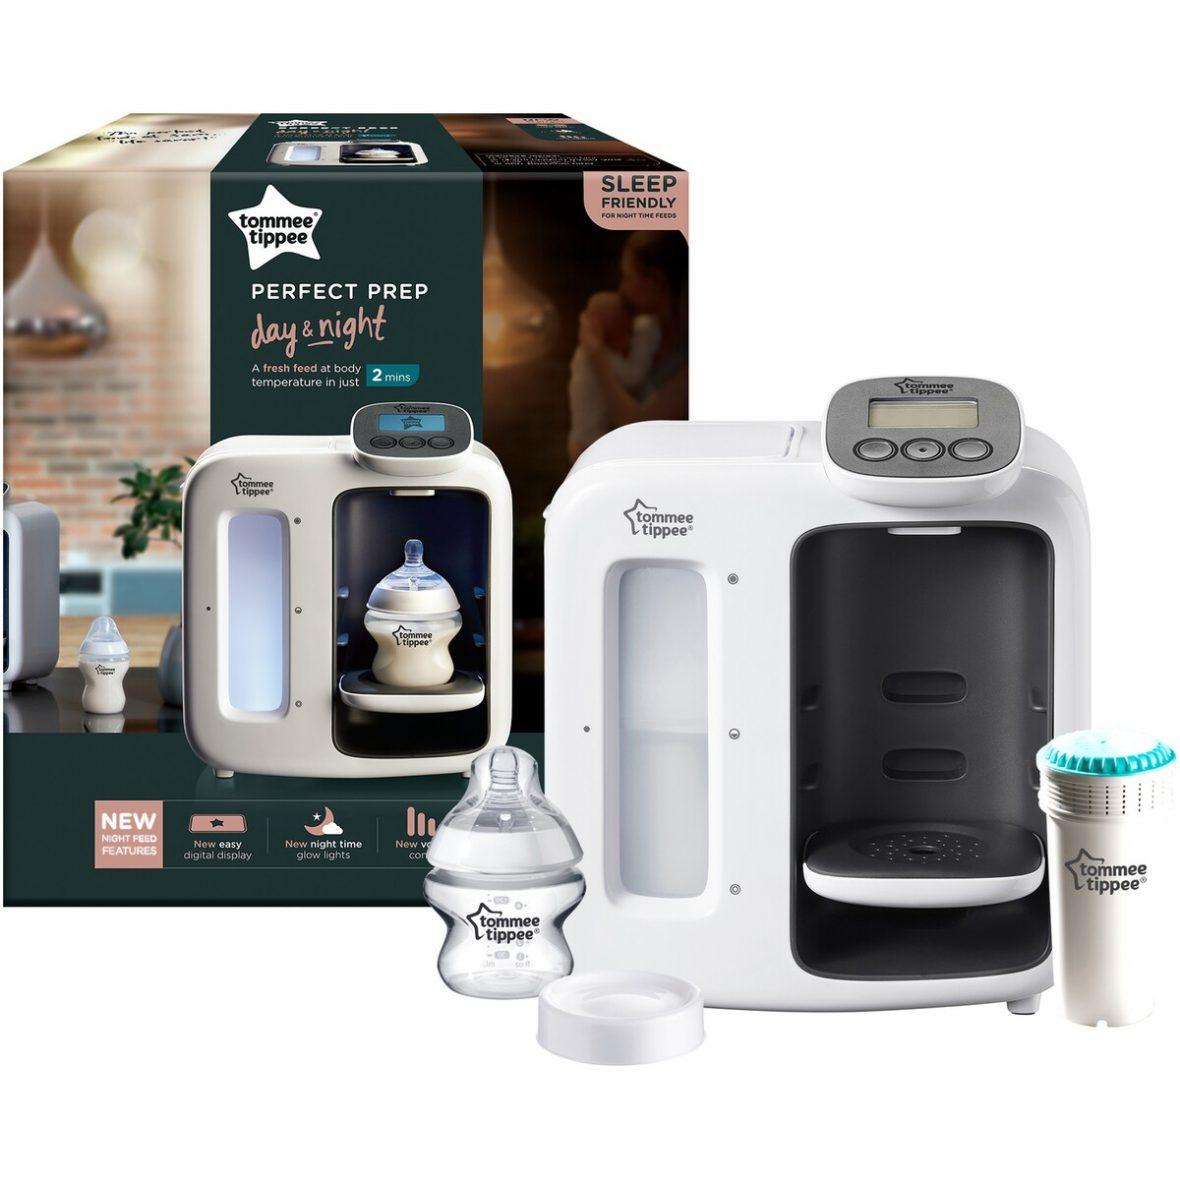 Tommee Tippee Perfect Prep Day & Night – Συσκευή Προετοιμασίας Γάλακτος New